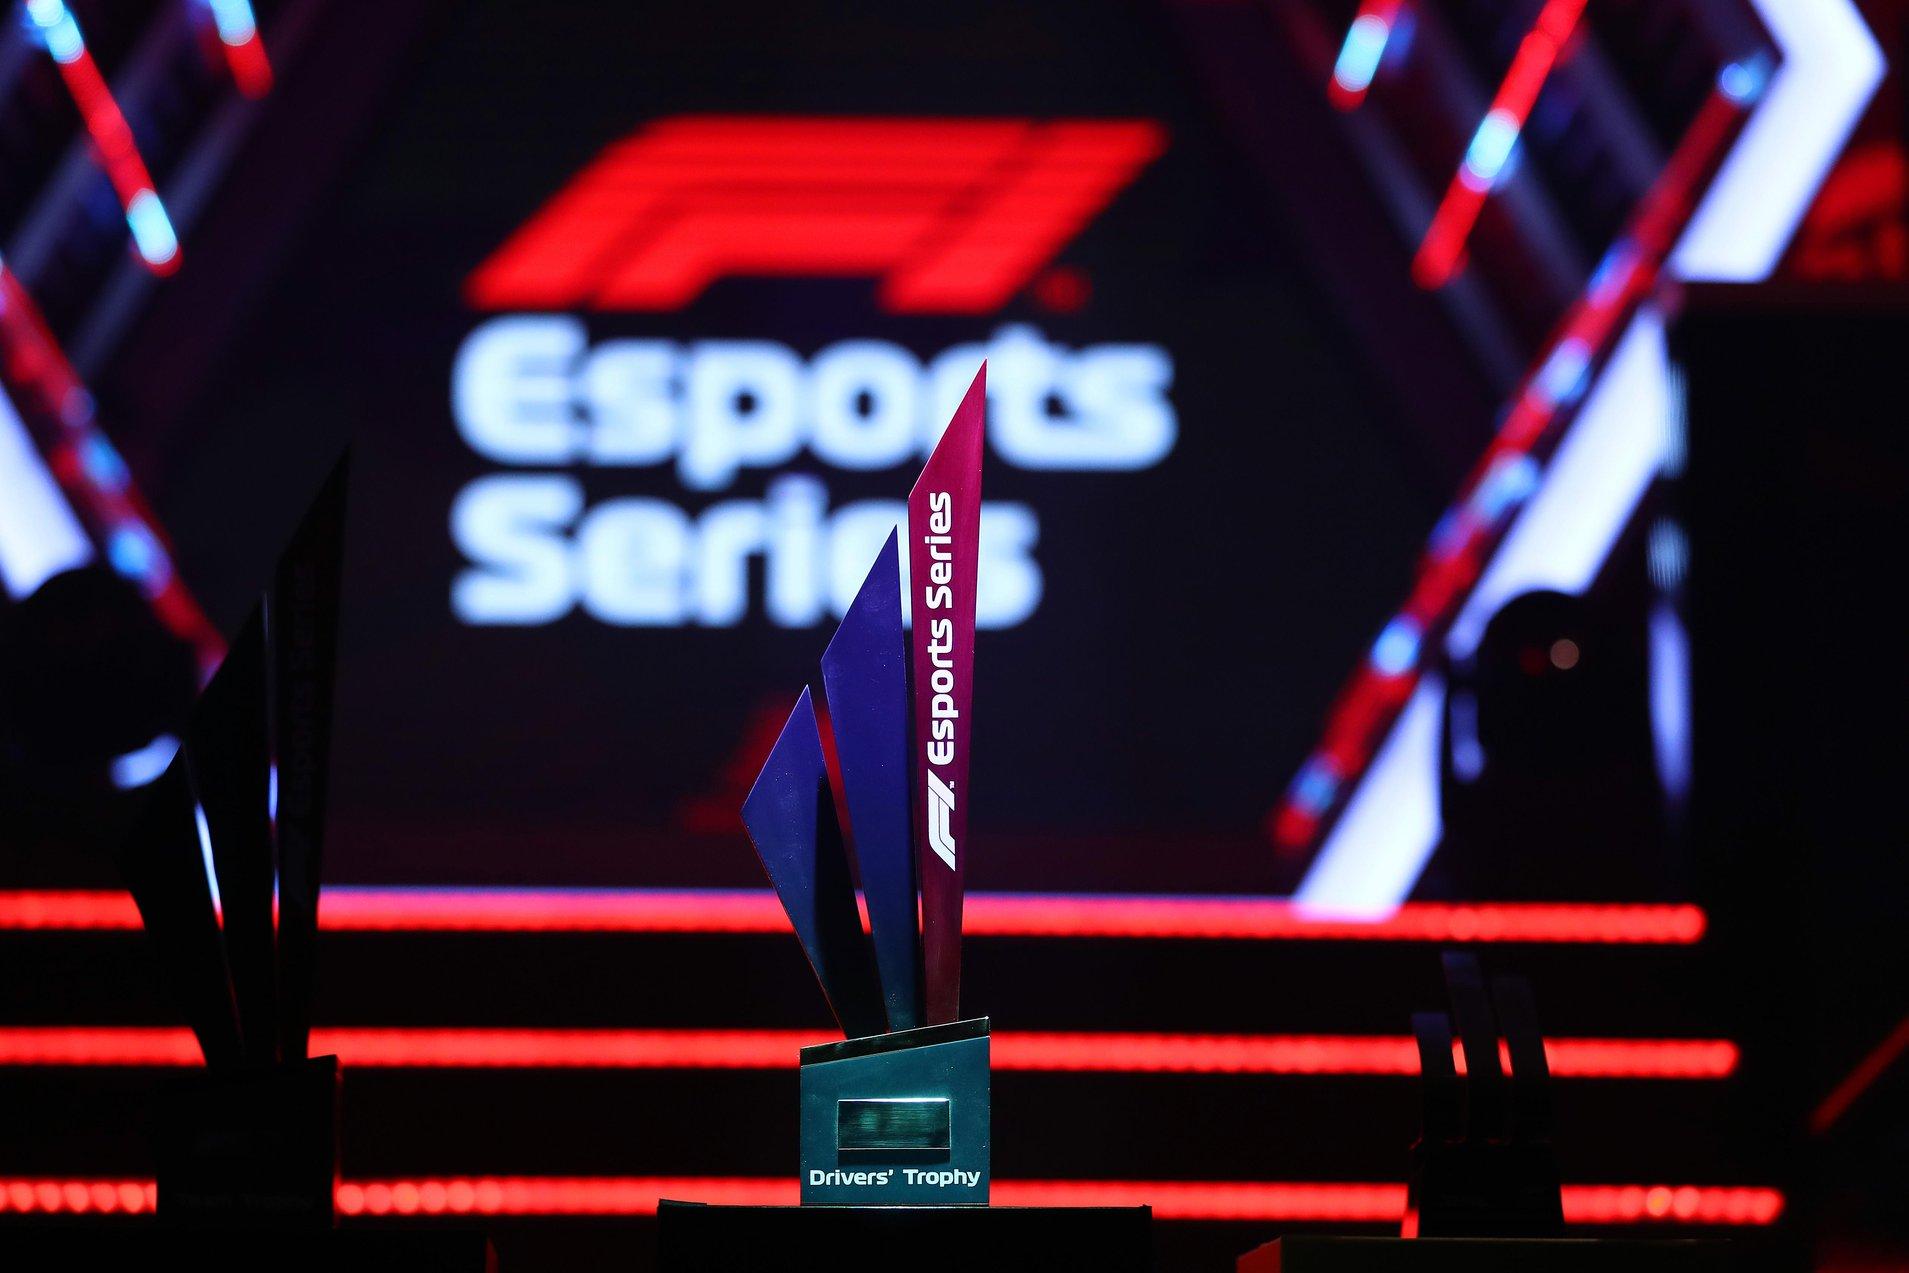 F1 Esport Series Grand Final – Gallery 15